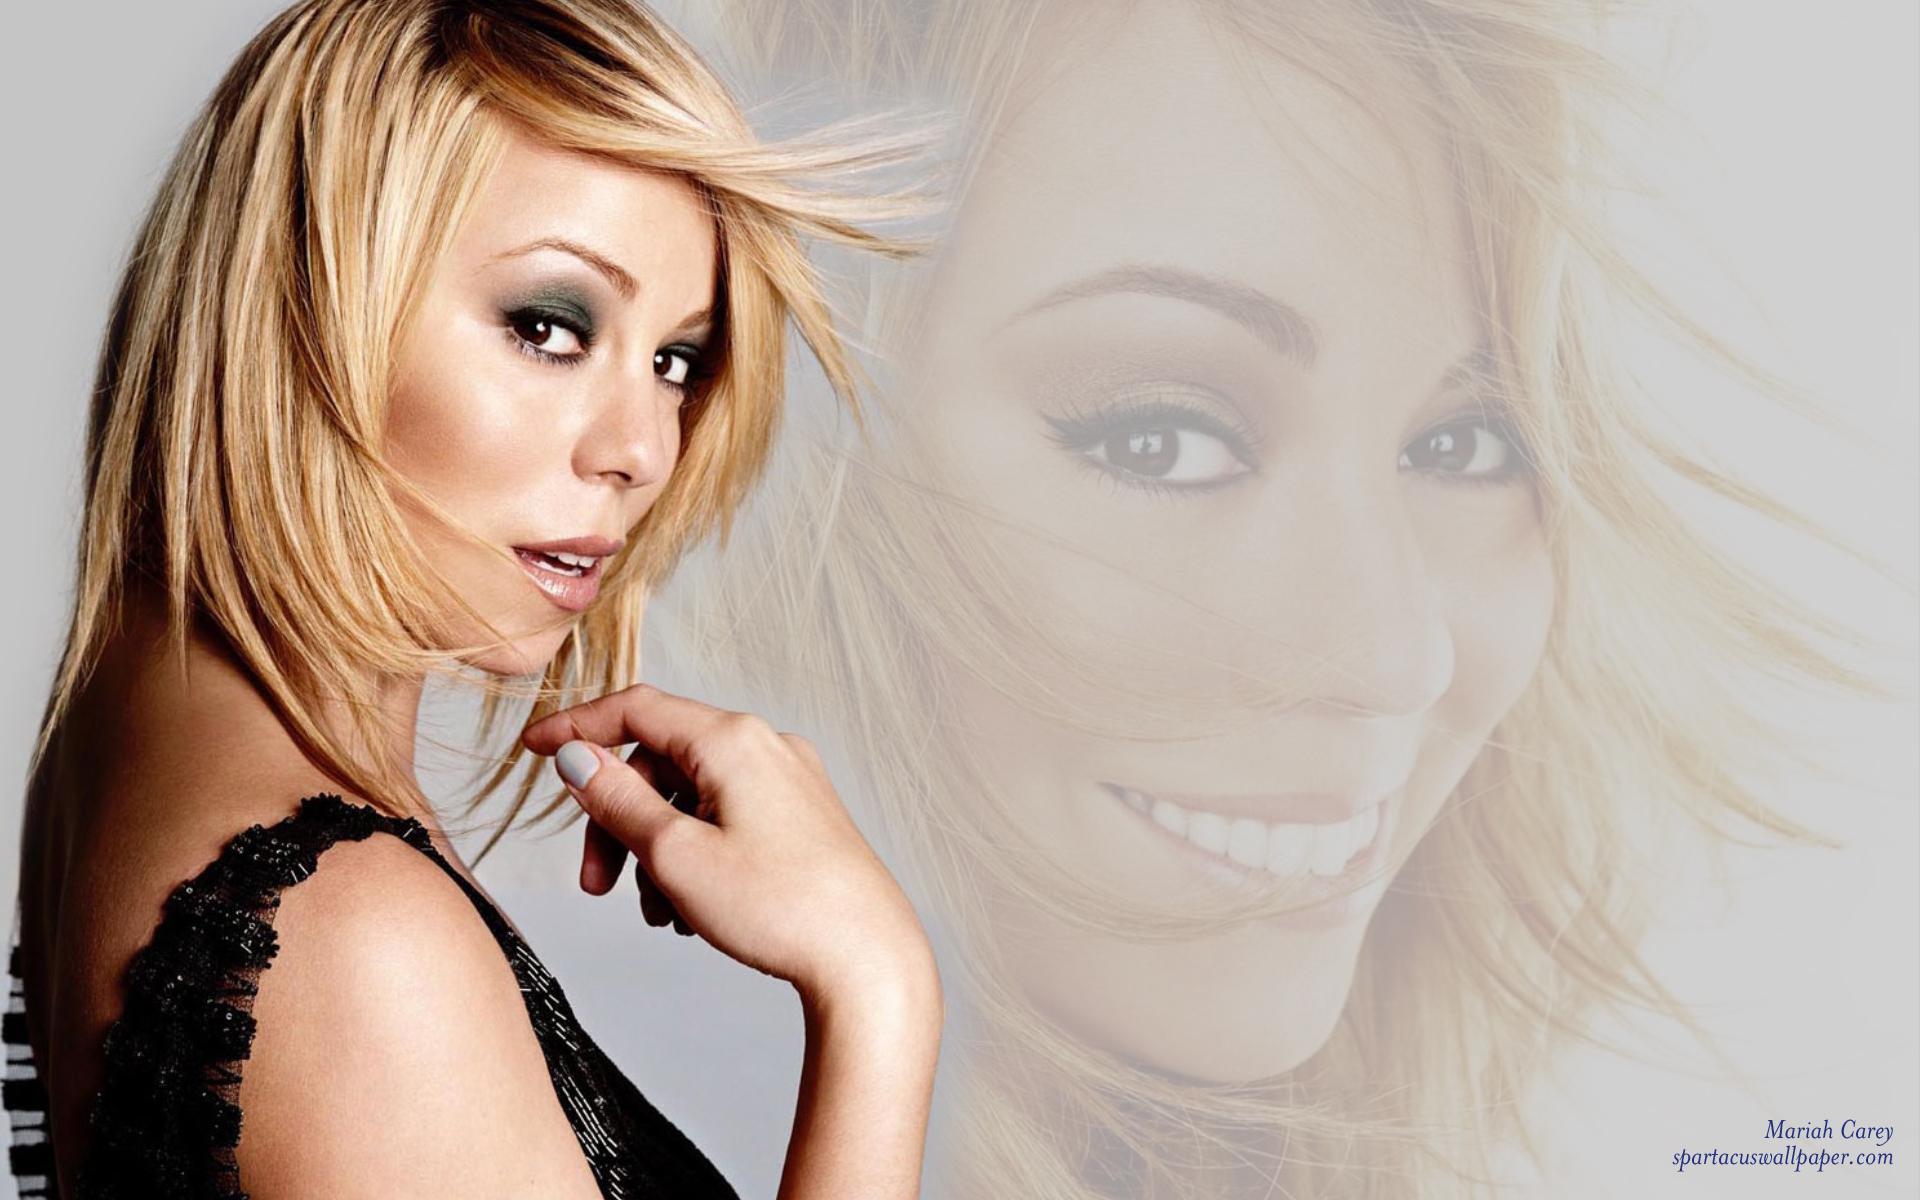 Mariah Carey Desktop Backgrounds Mobile Home Screens